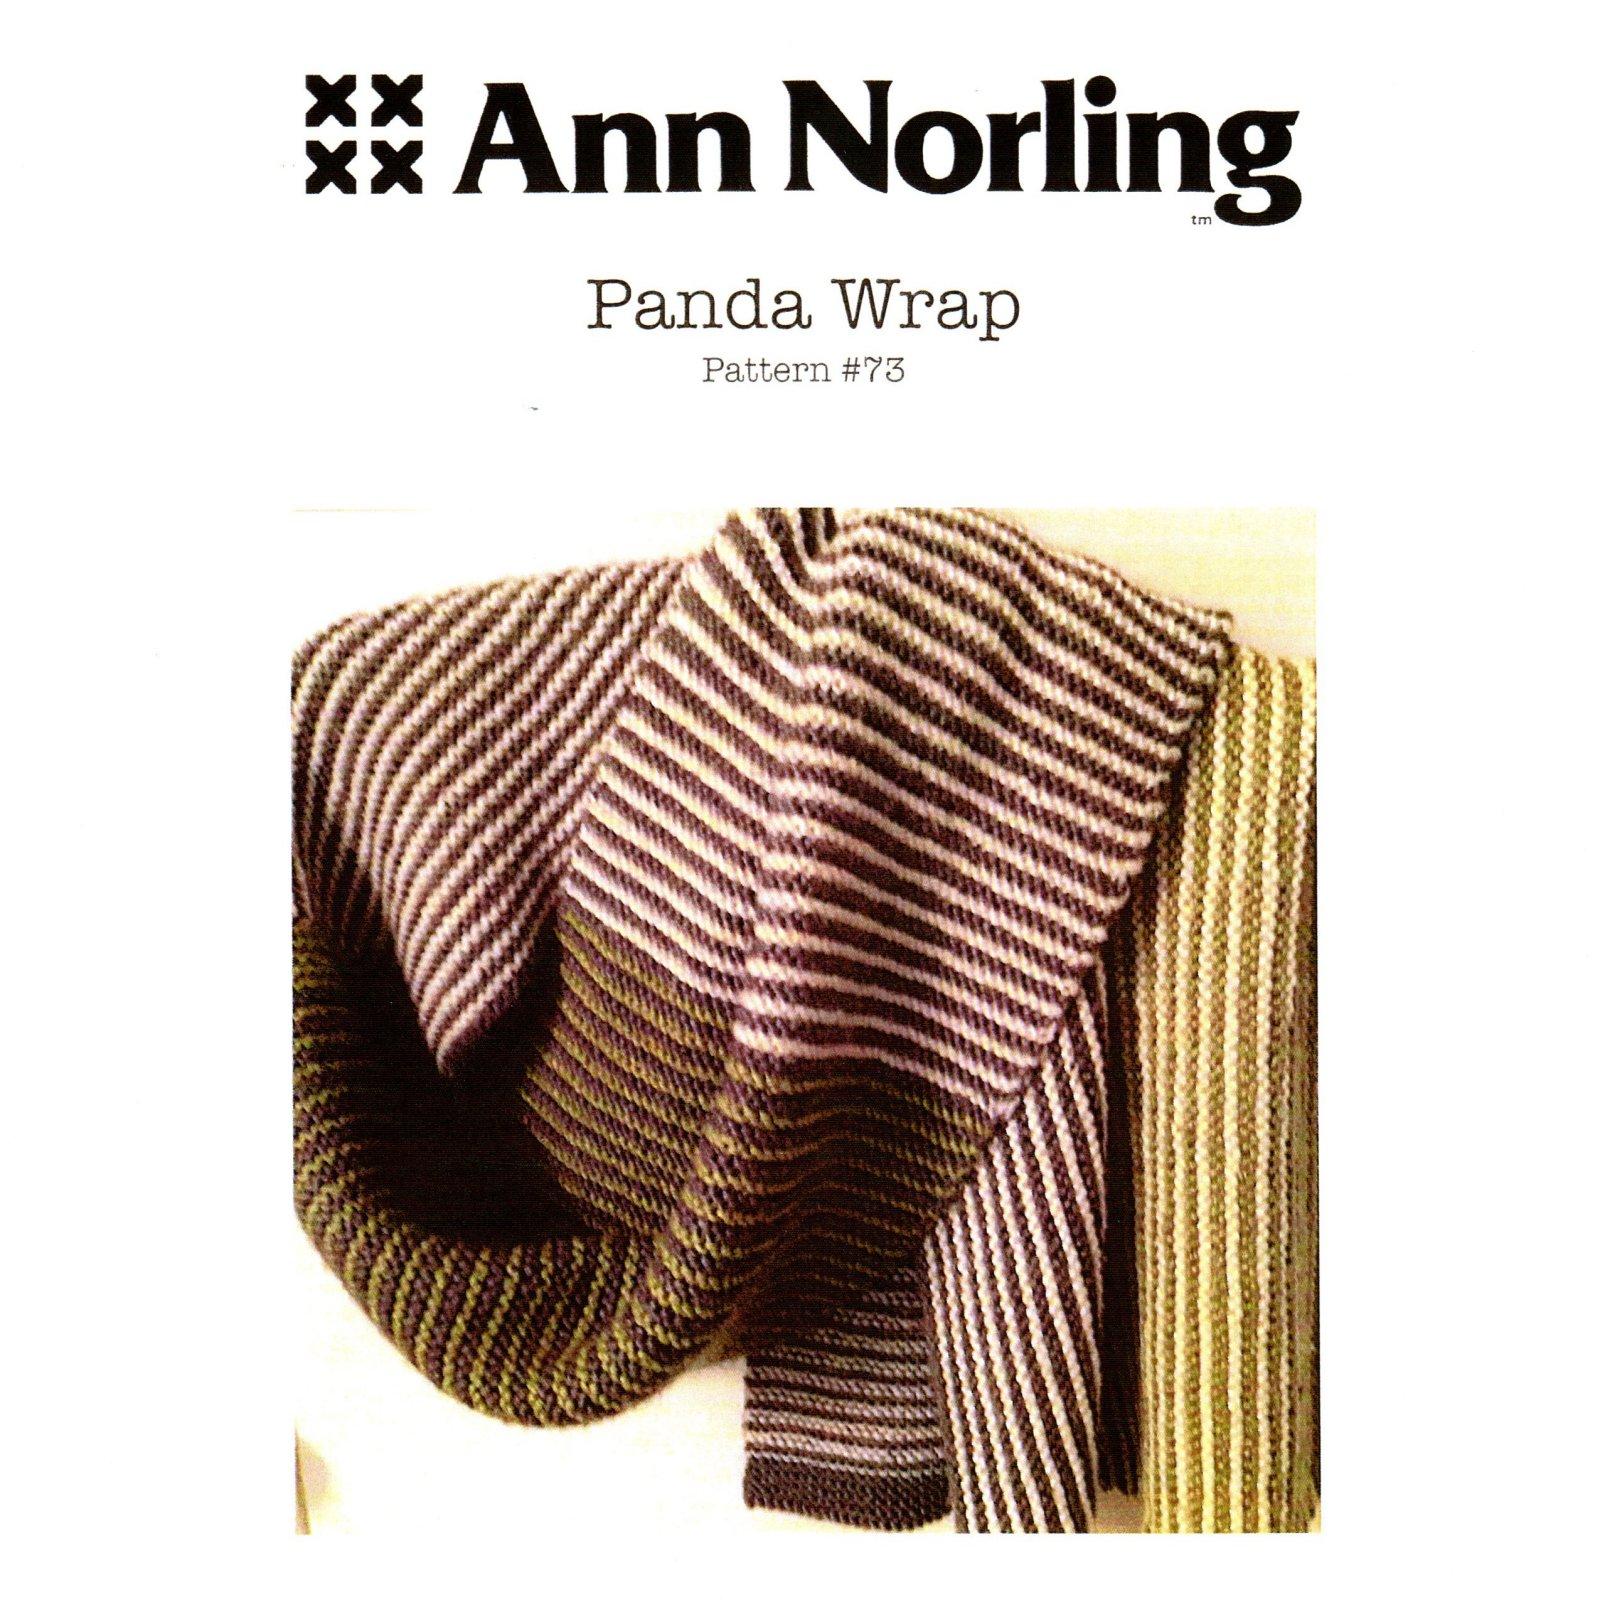 Ann Norling